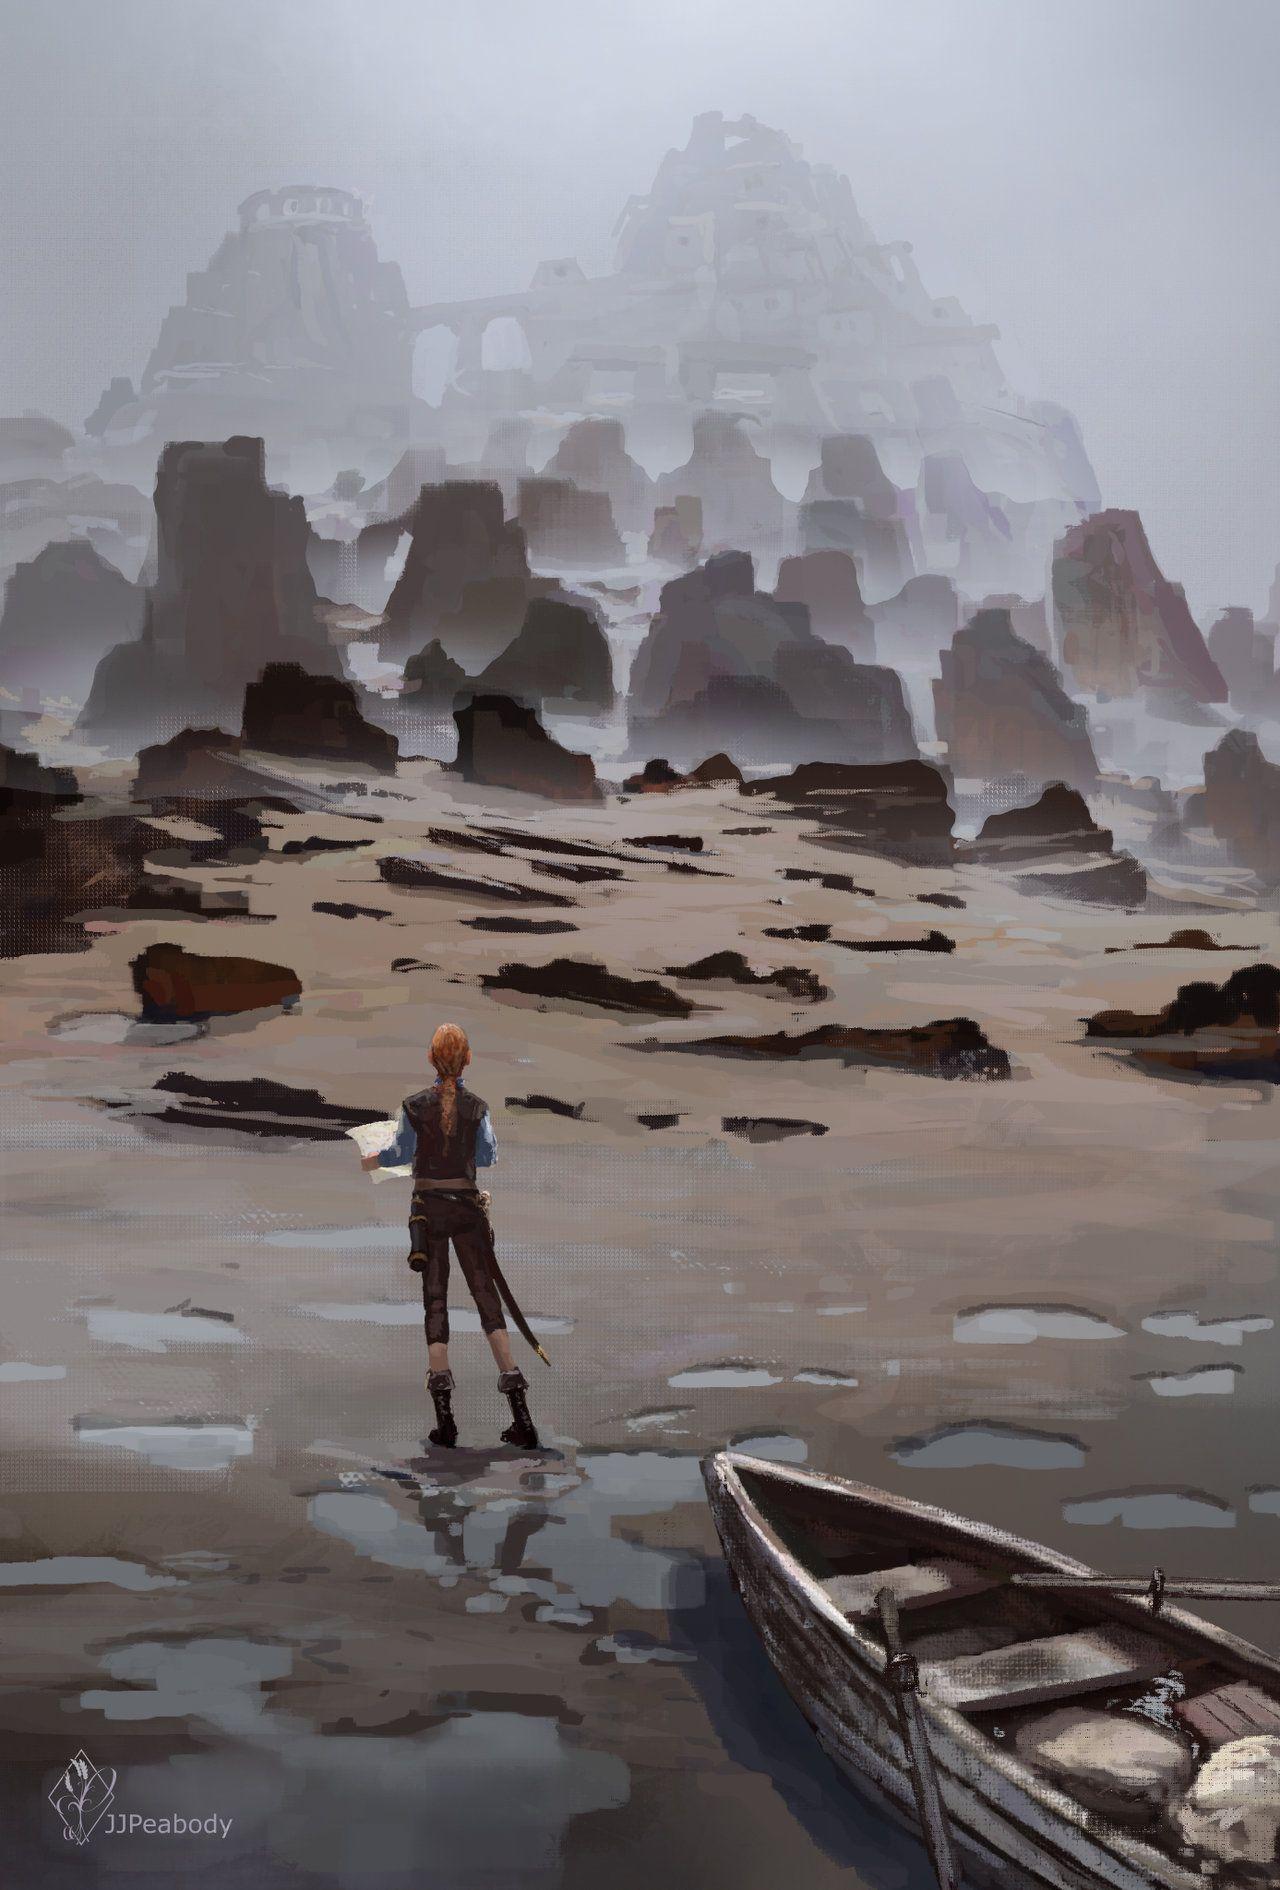 Strange Shores by jjpeabody.deviantart.com on @DeviantArt